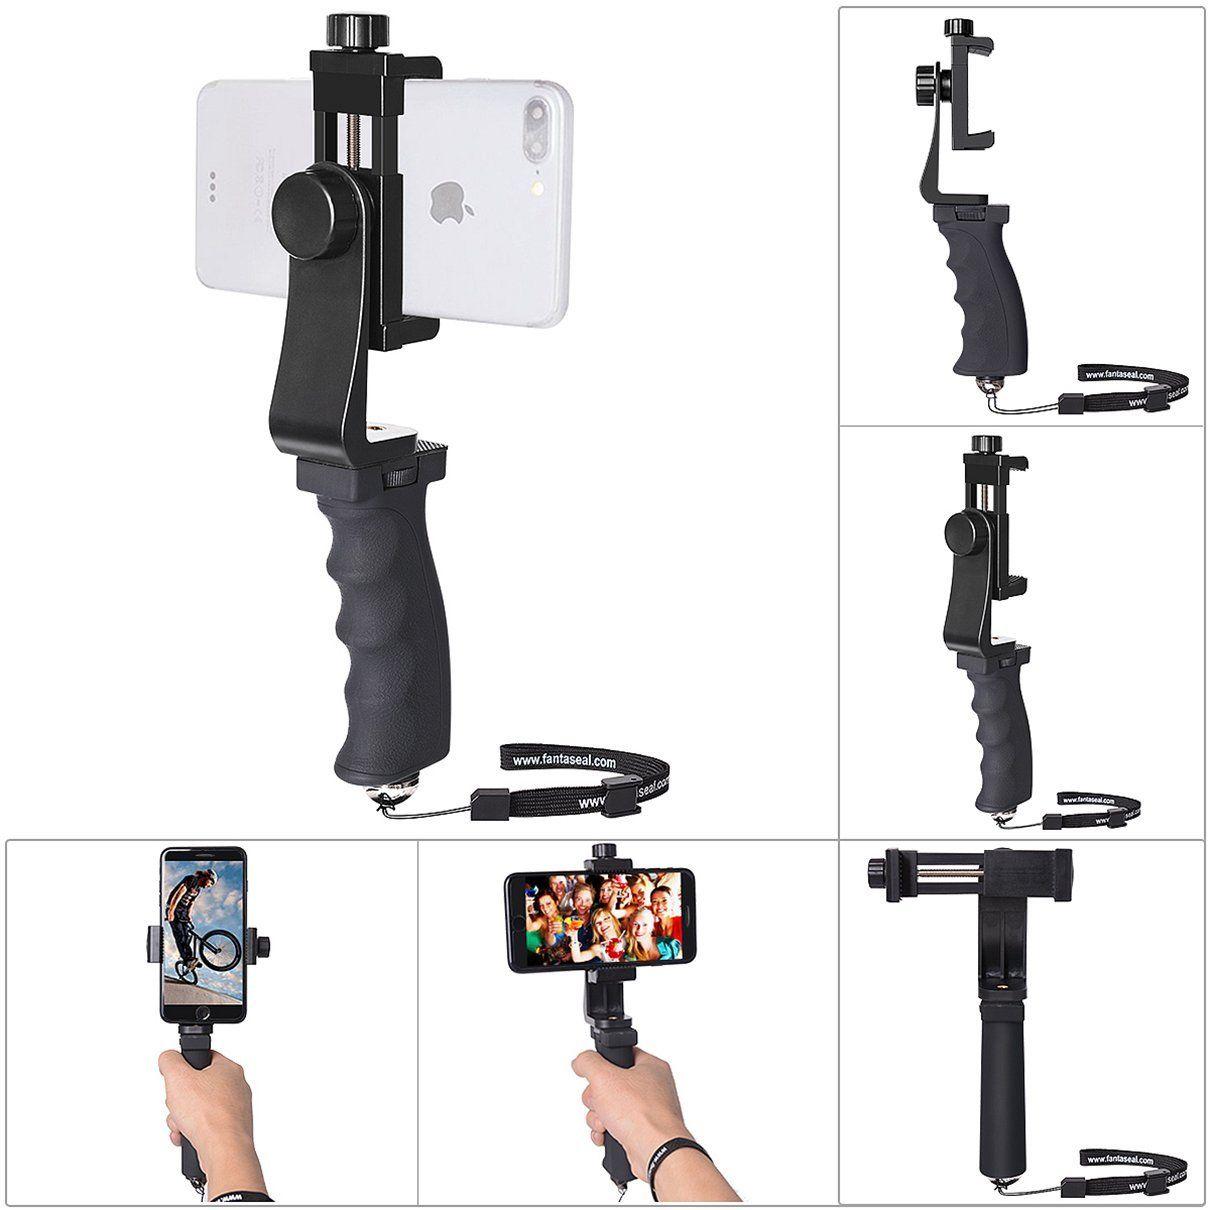 Fantaseal iphone cell phone hand grip holder smartphone